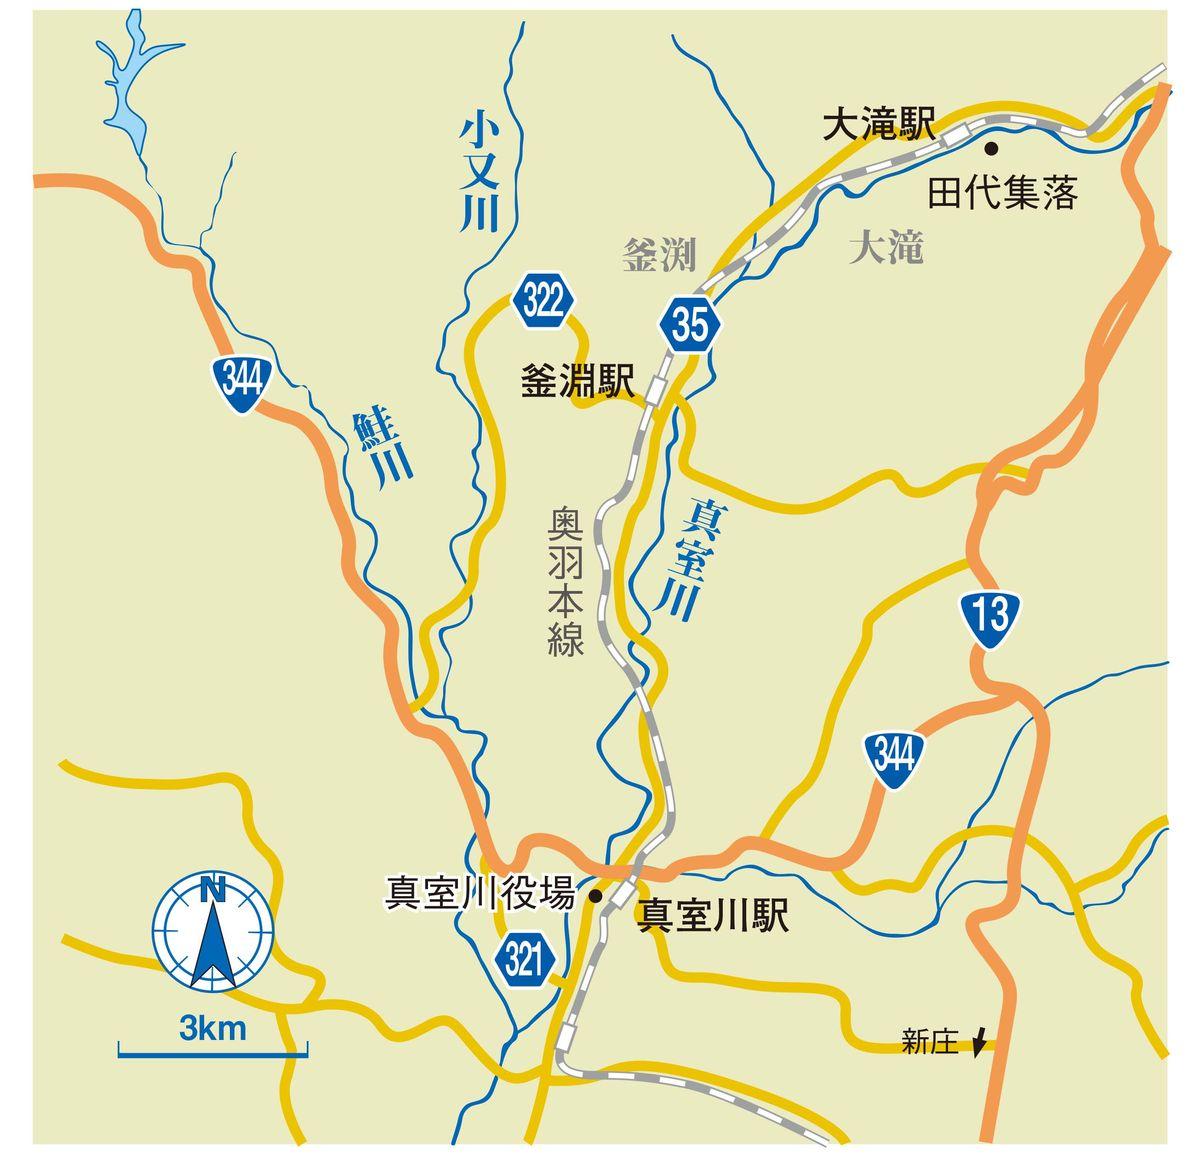 039-051best keiryu_cs6 (1)